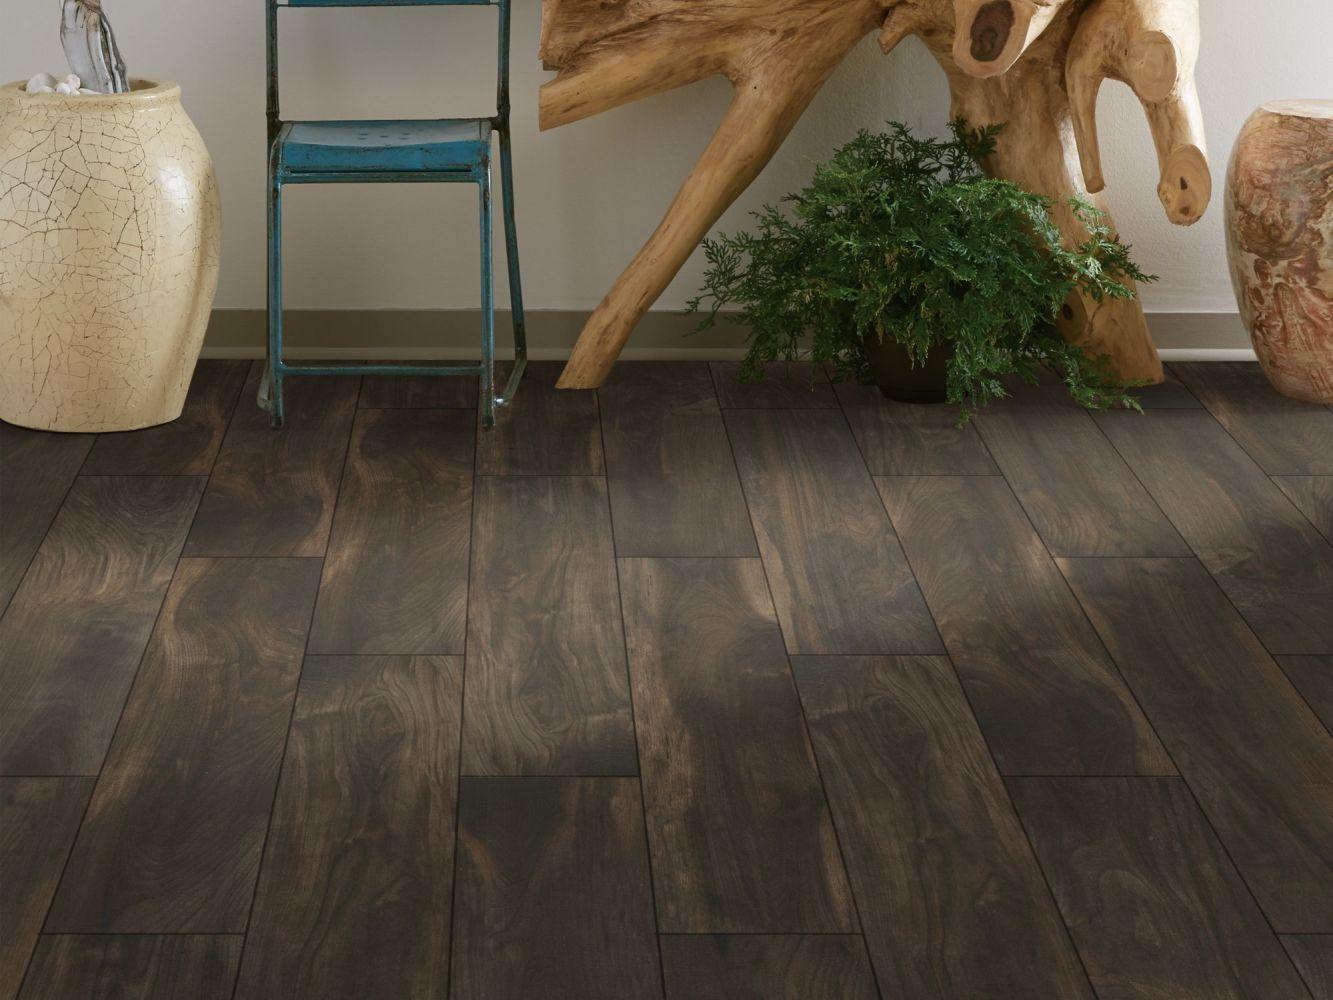 Shaw Floors Ceramic Solutions Heirloom 8 X 36 Silhouette 00770_CS39Z